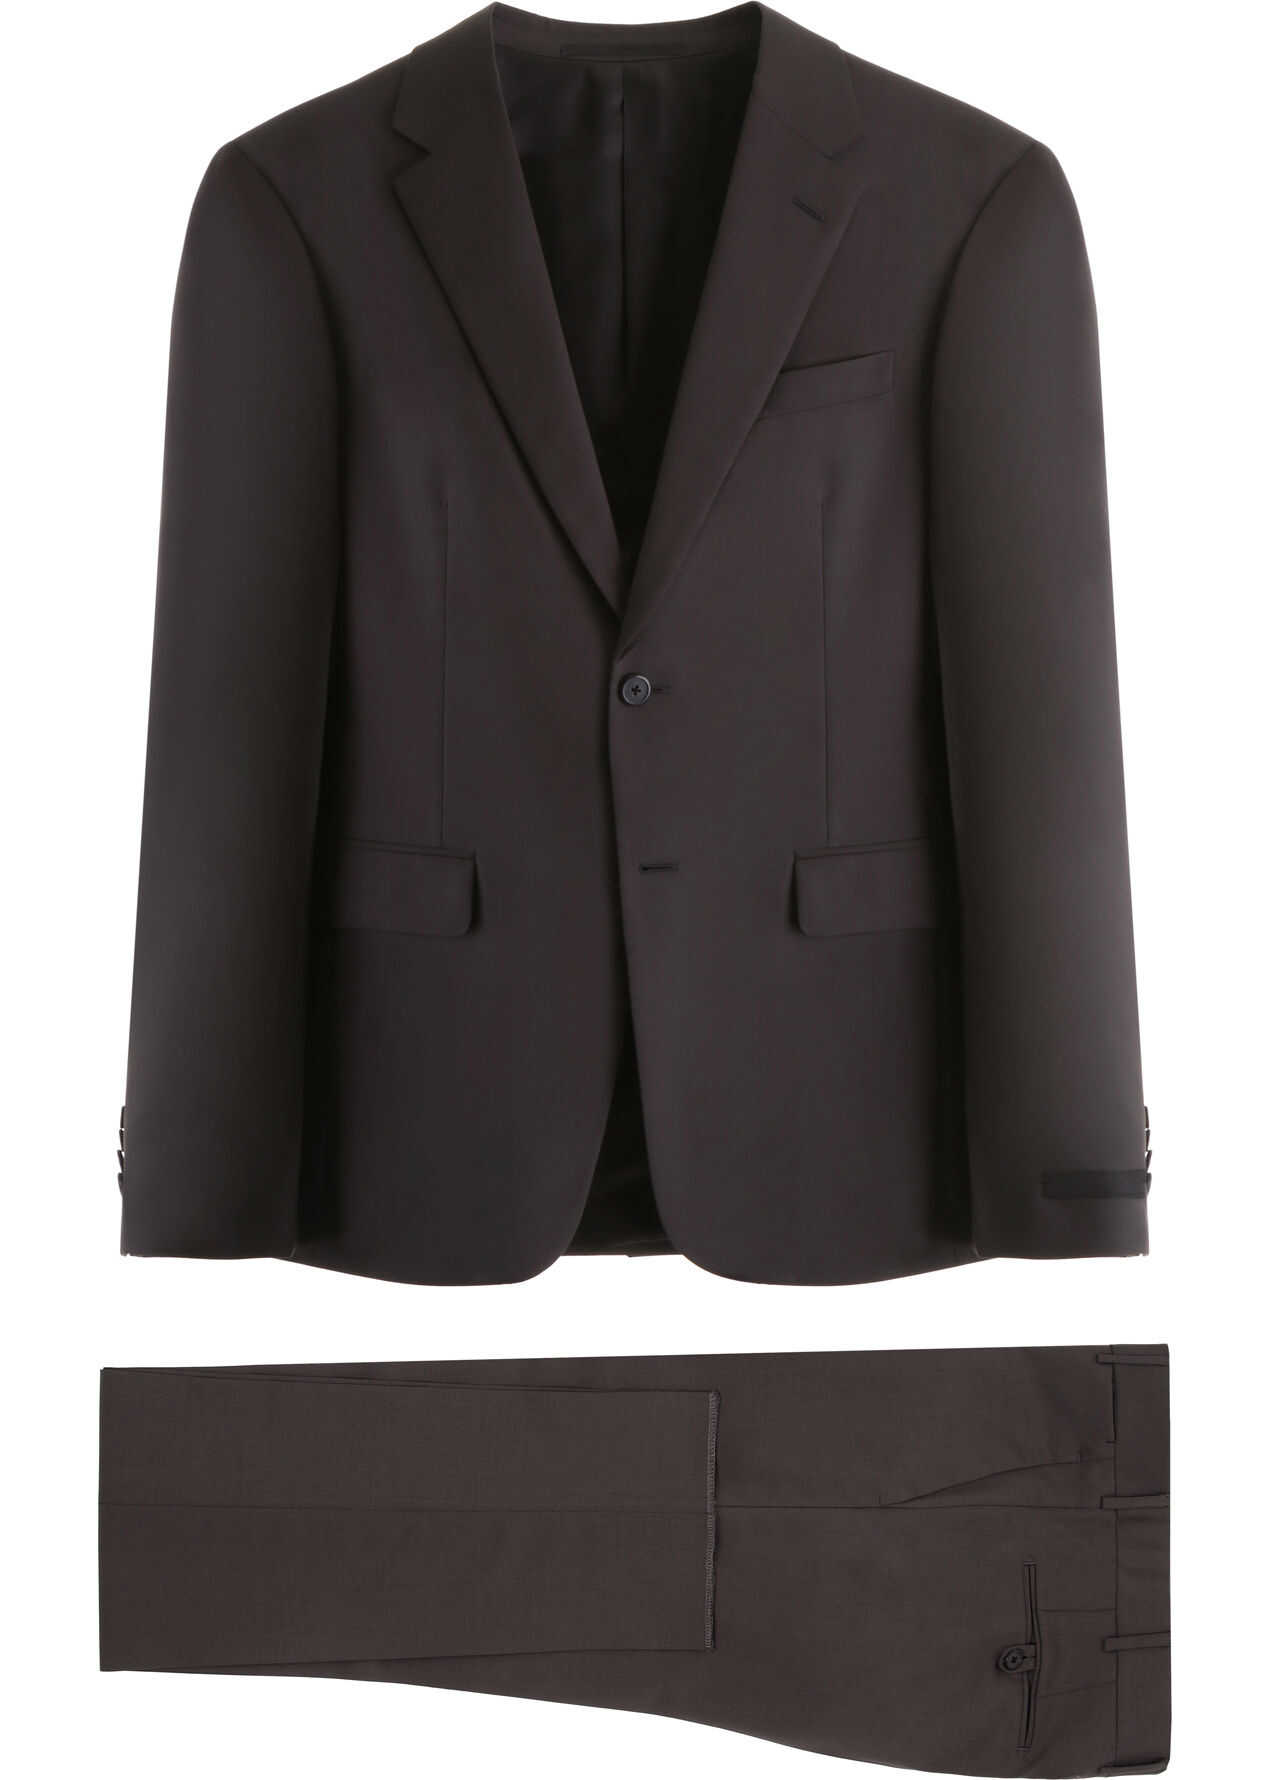 Prada Mohair Wool Suit FERRO